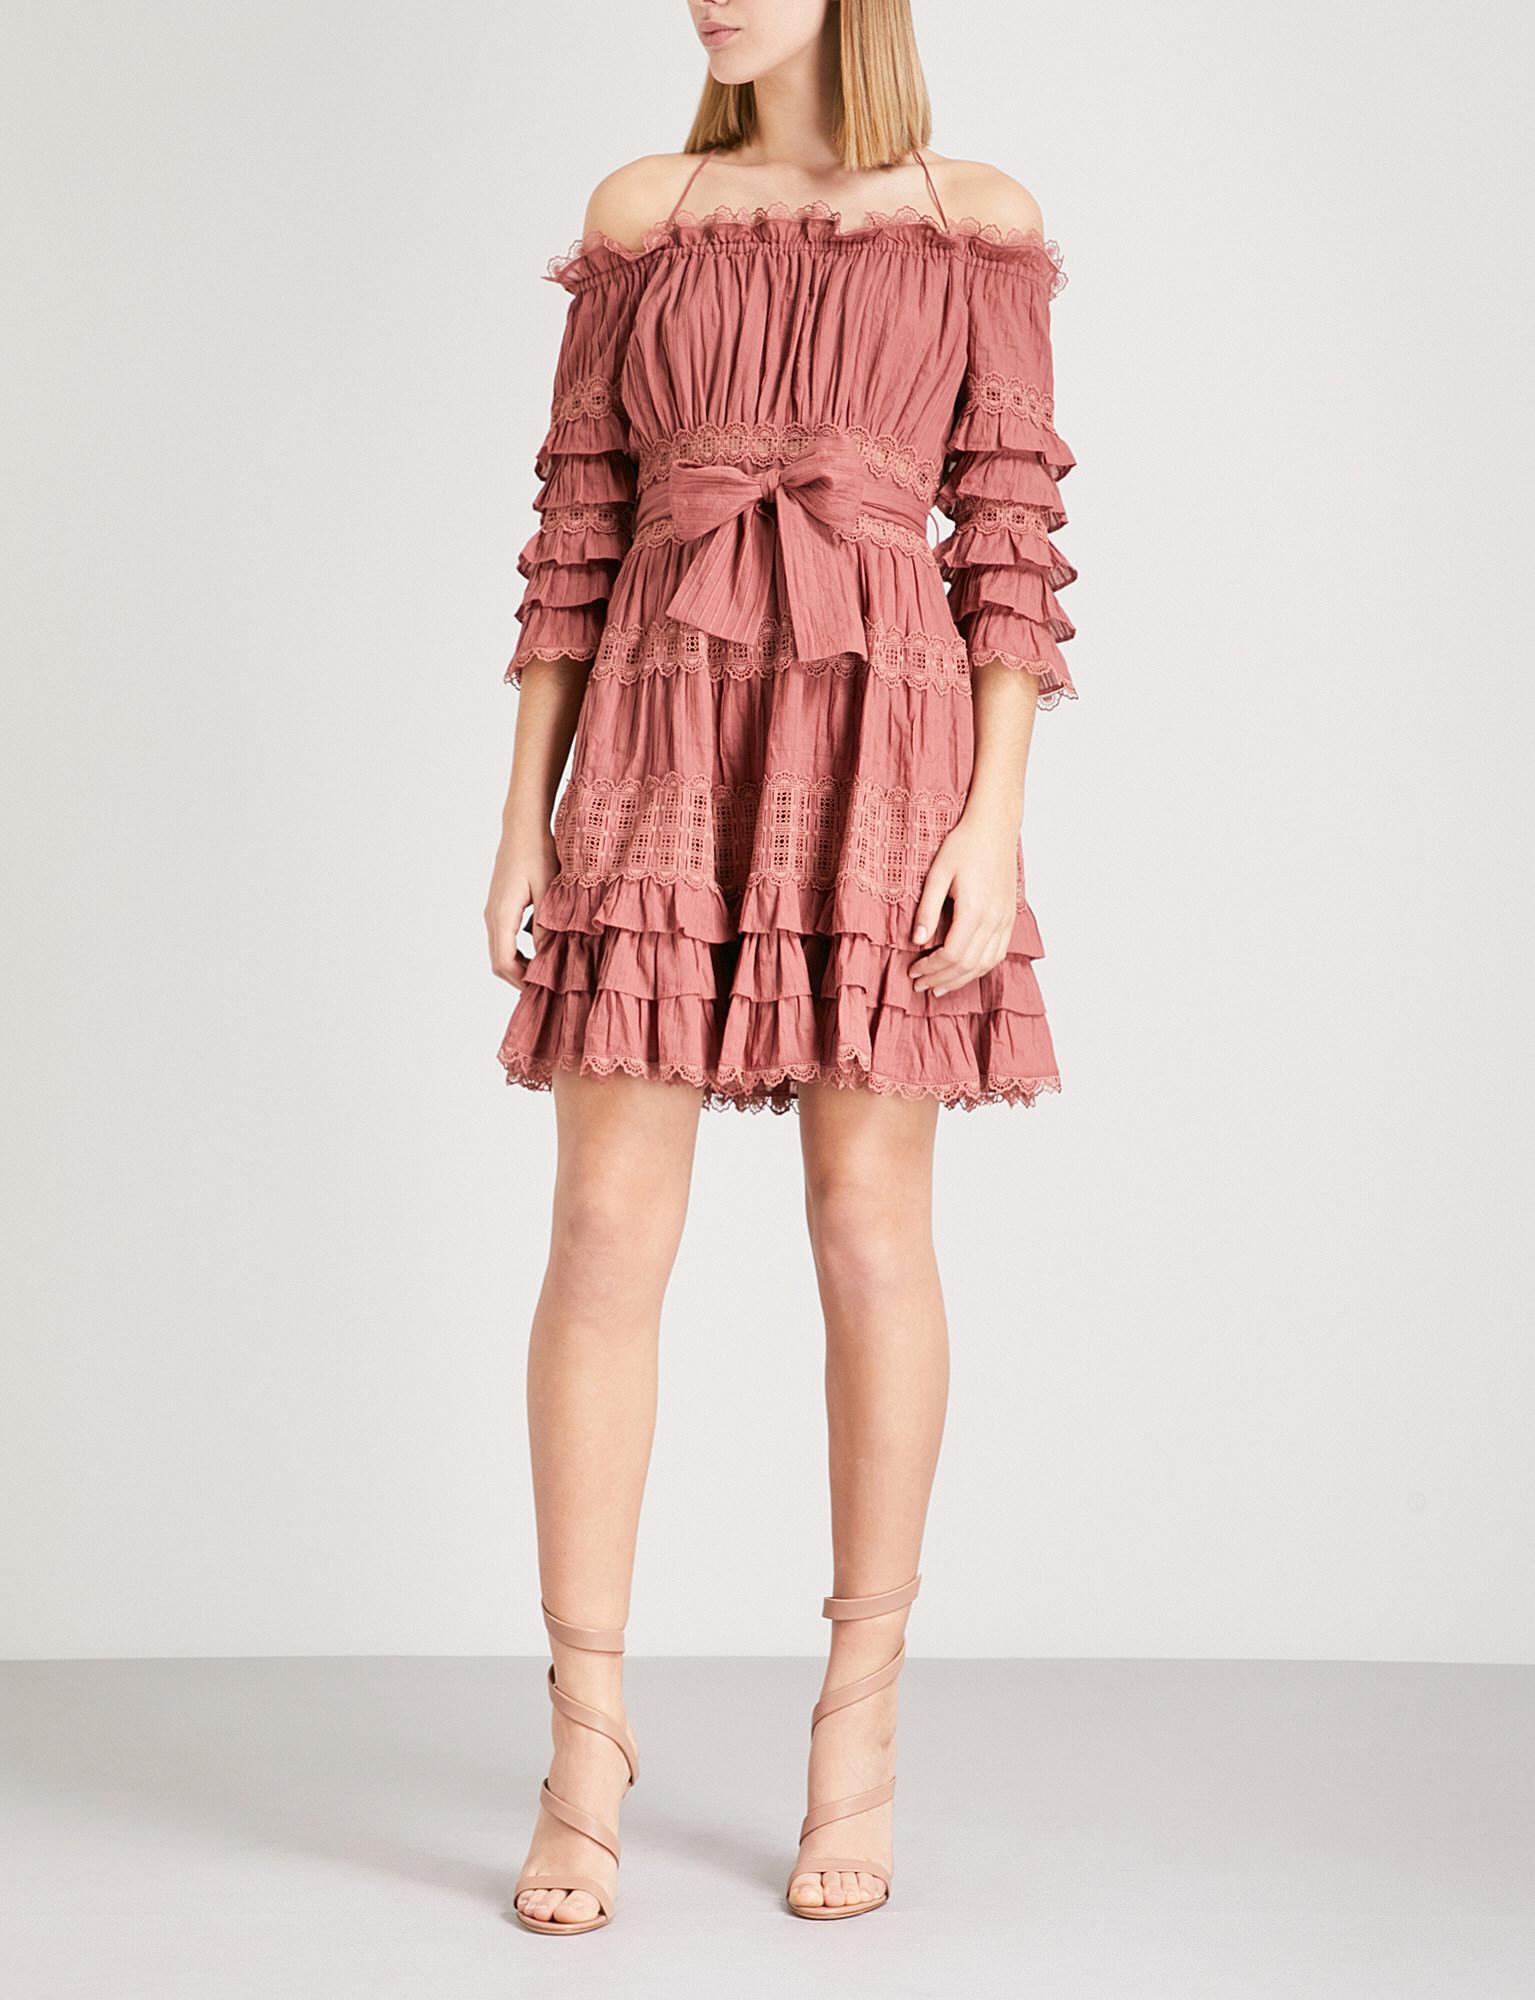 Womens Corsair Cotton Tiered Off-The-Shoulder Dress Zimmermann NGTj4a